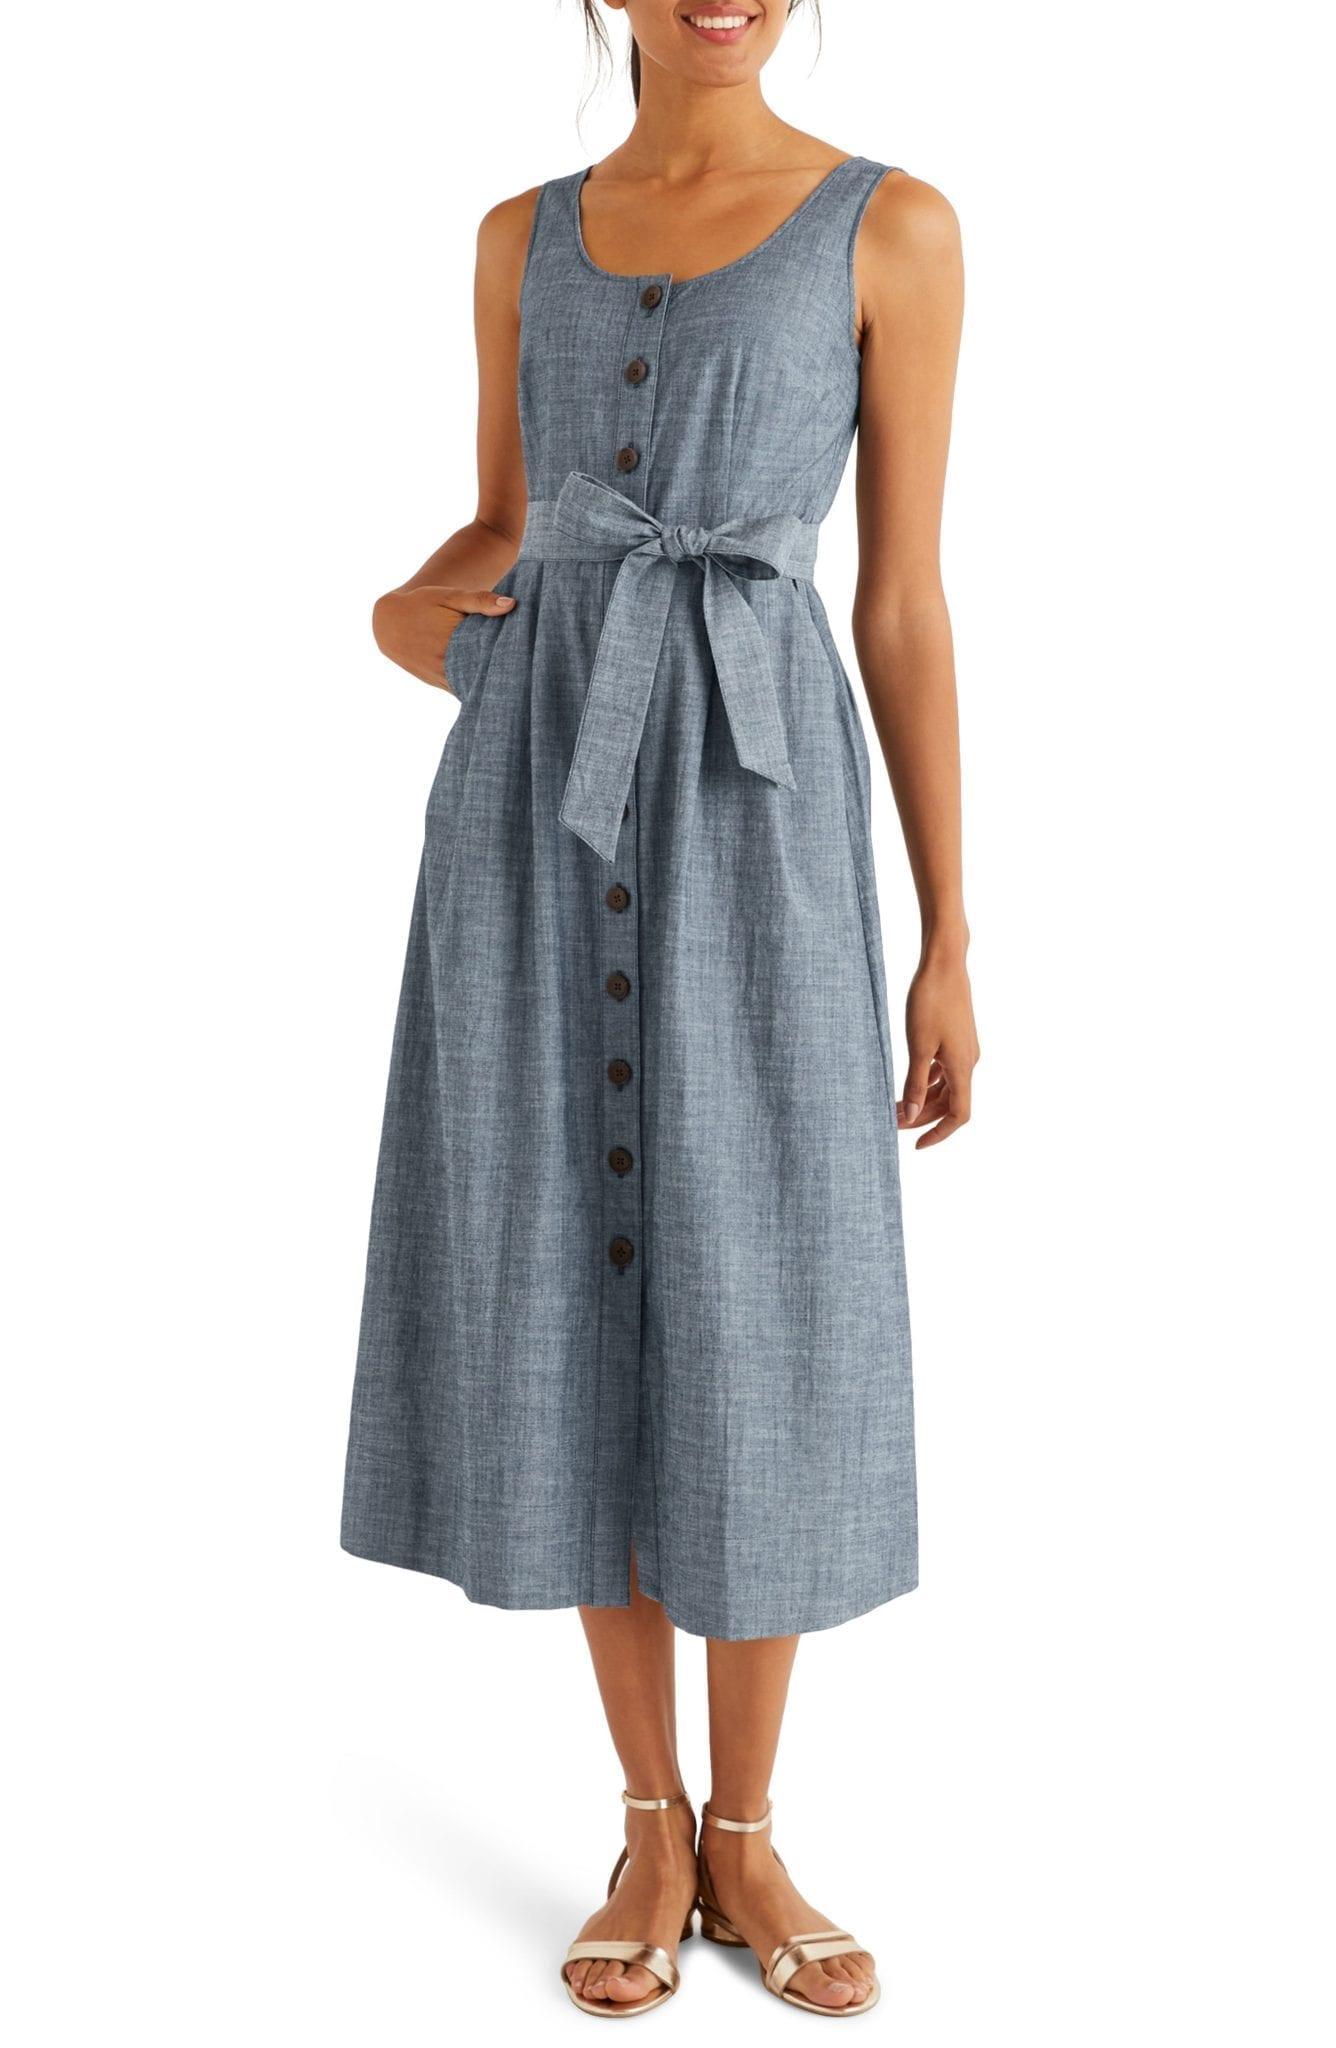 BODEN Joanna Midi Dress